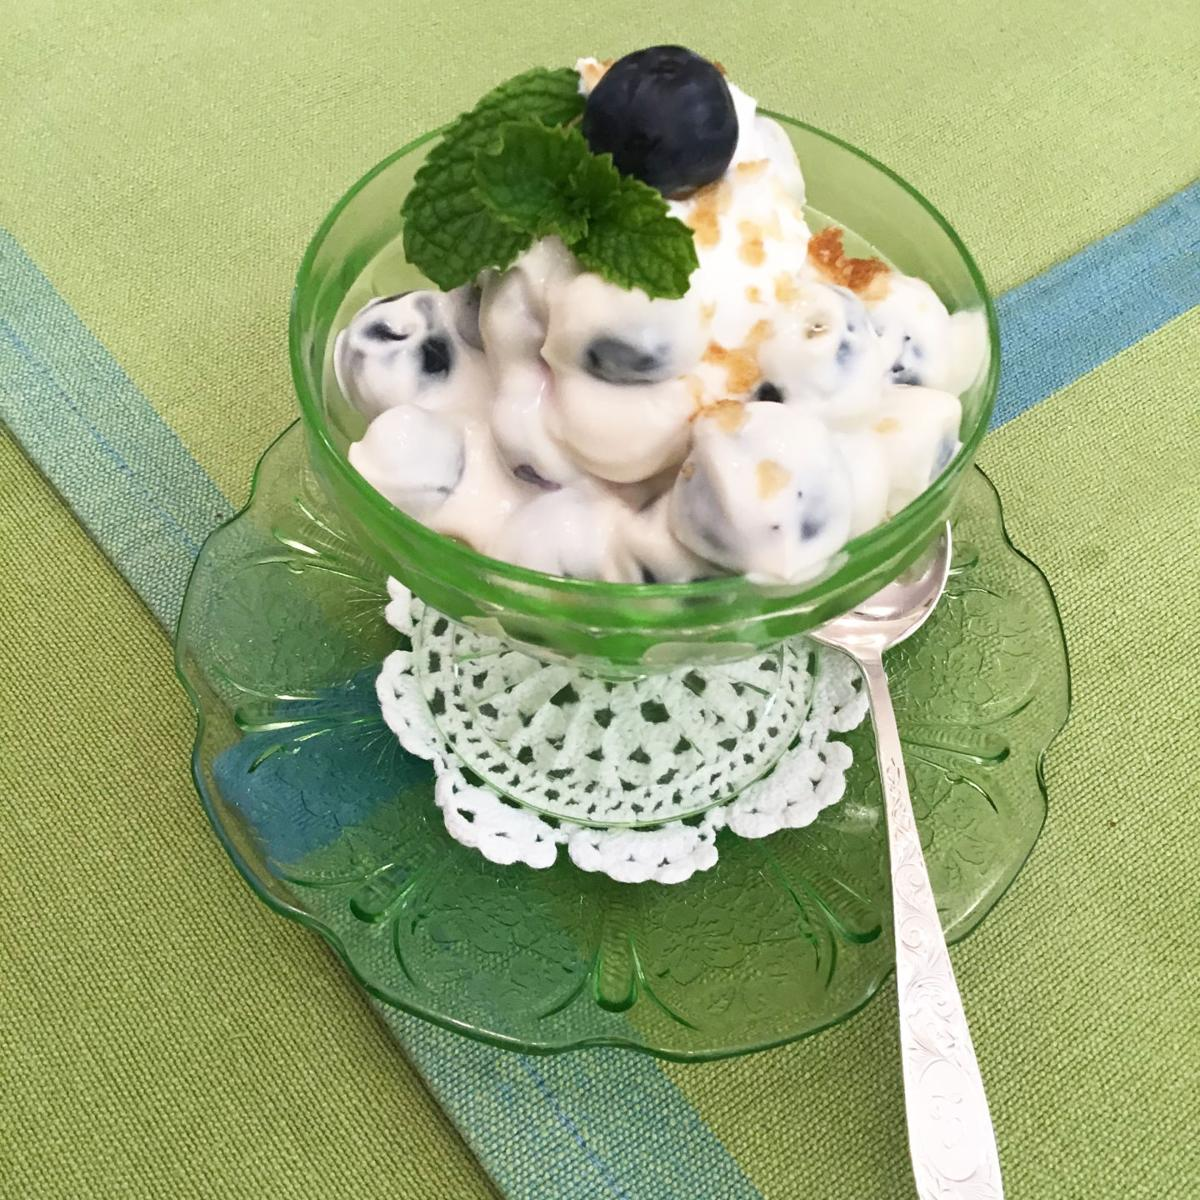 Delicious Blueberry Dessert